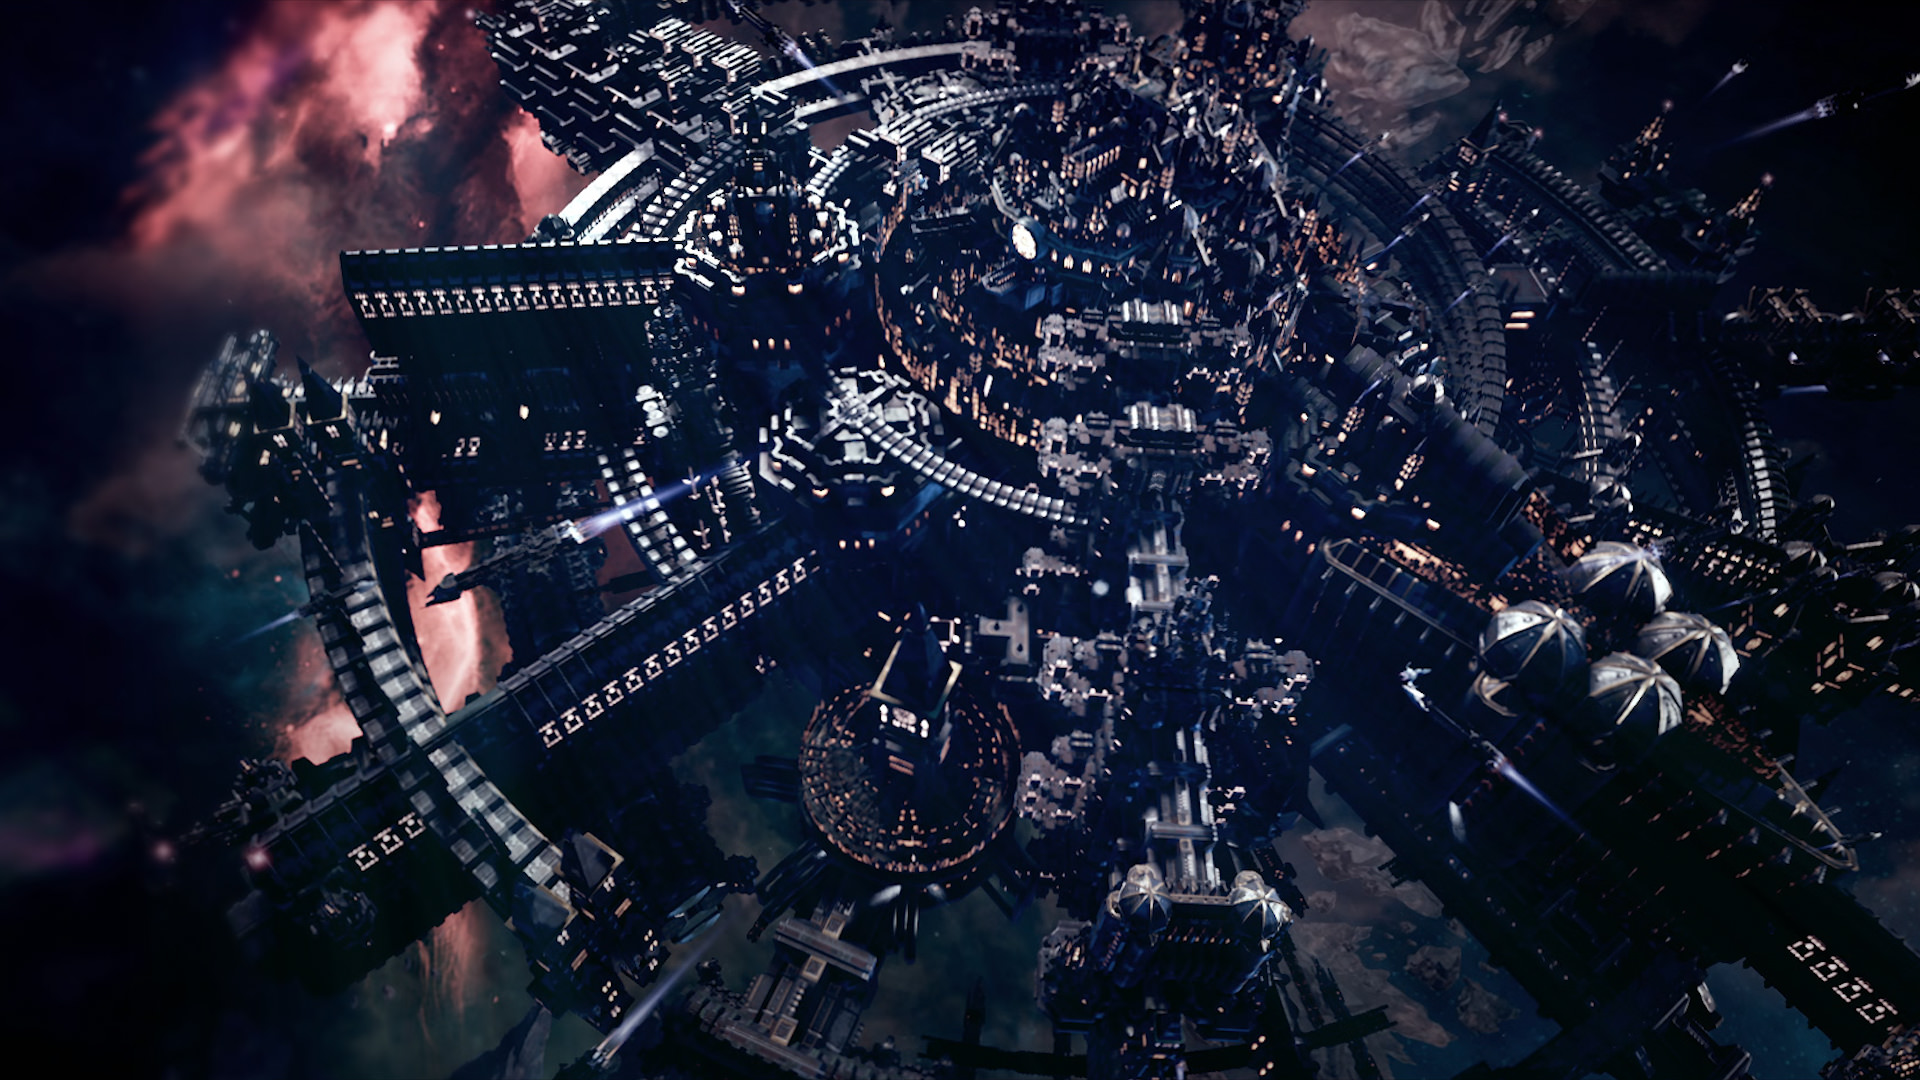 Battlefleet Gothic Armada HD Wallpaper Background Image 1920x1080